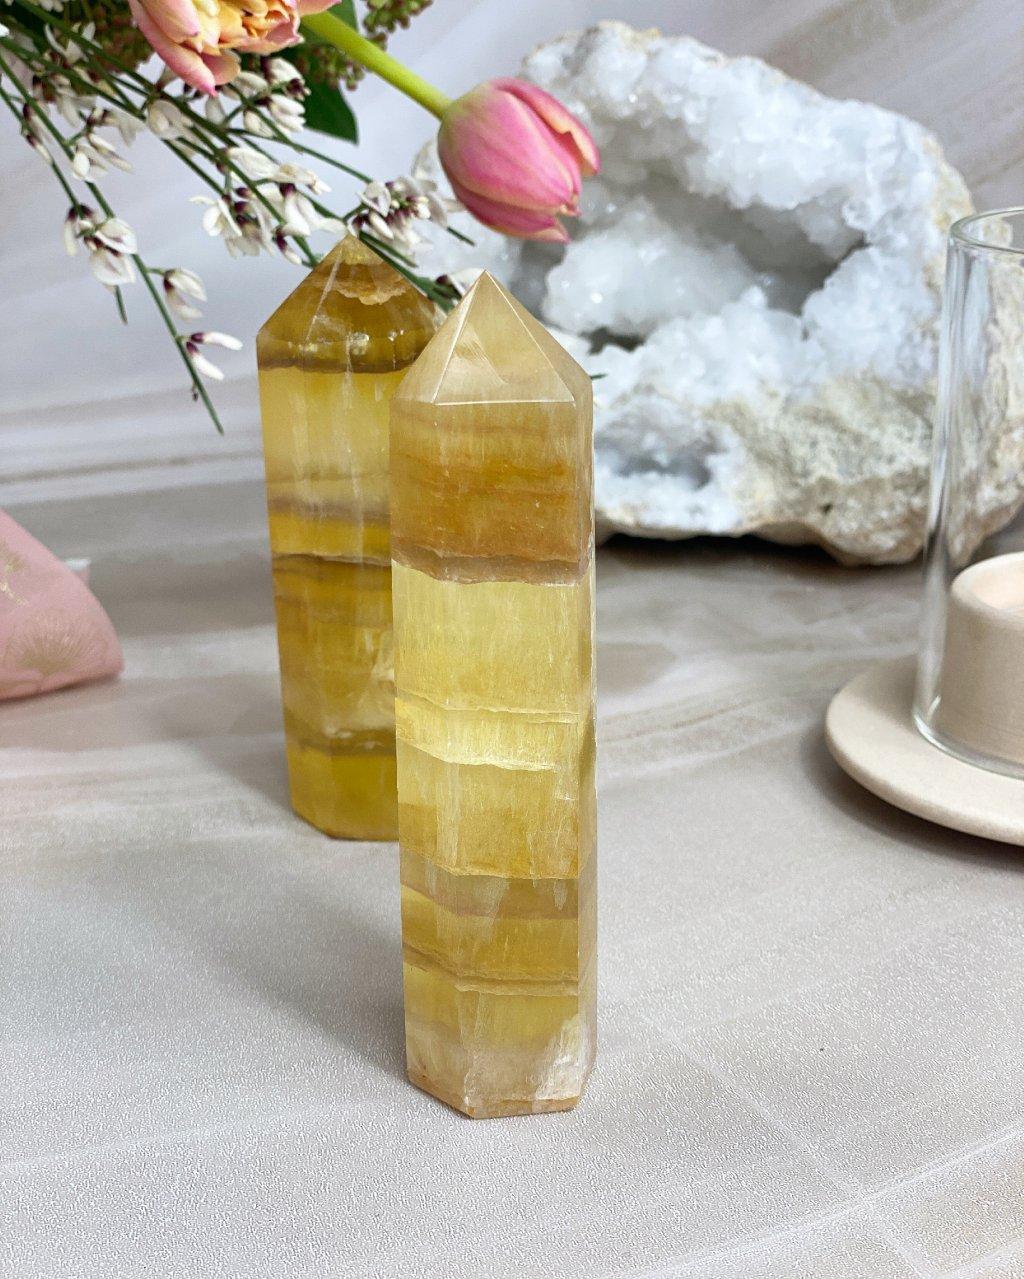 Fluorit hrot obelisk leštěný žlutý TOP kvalita 12cm